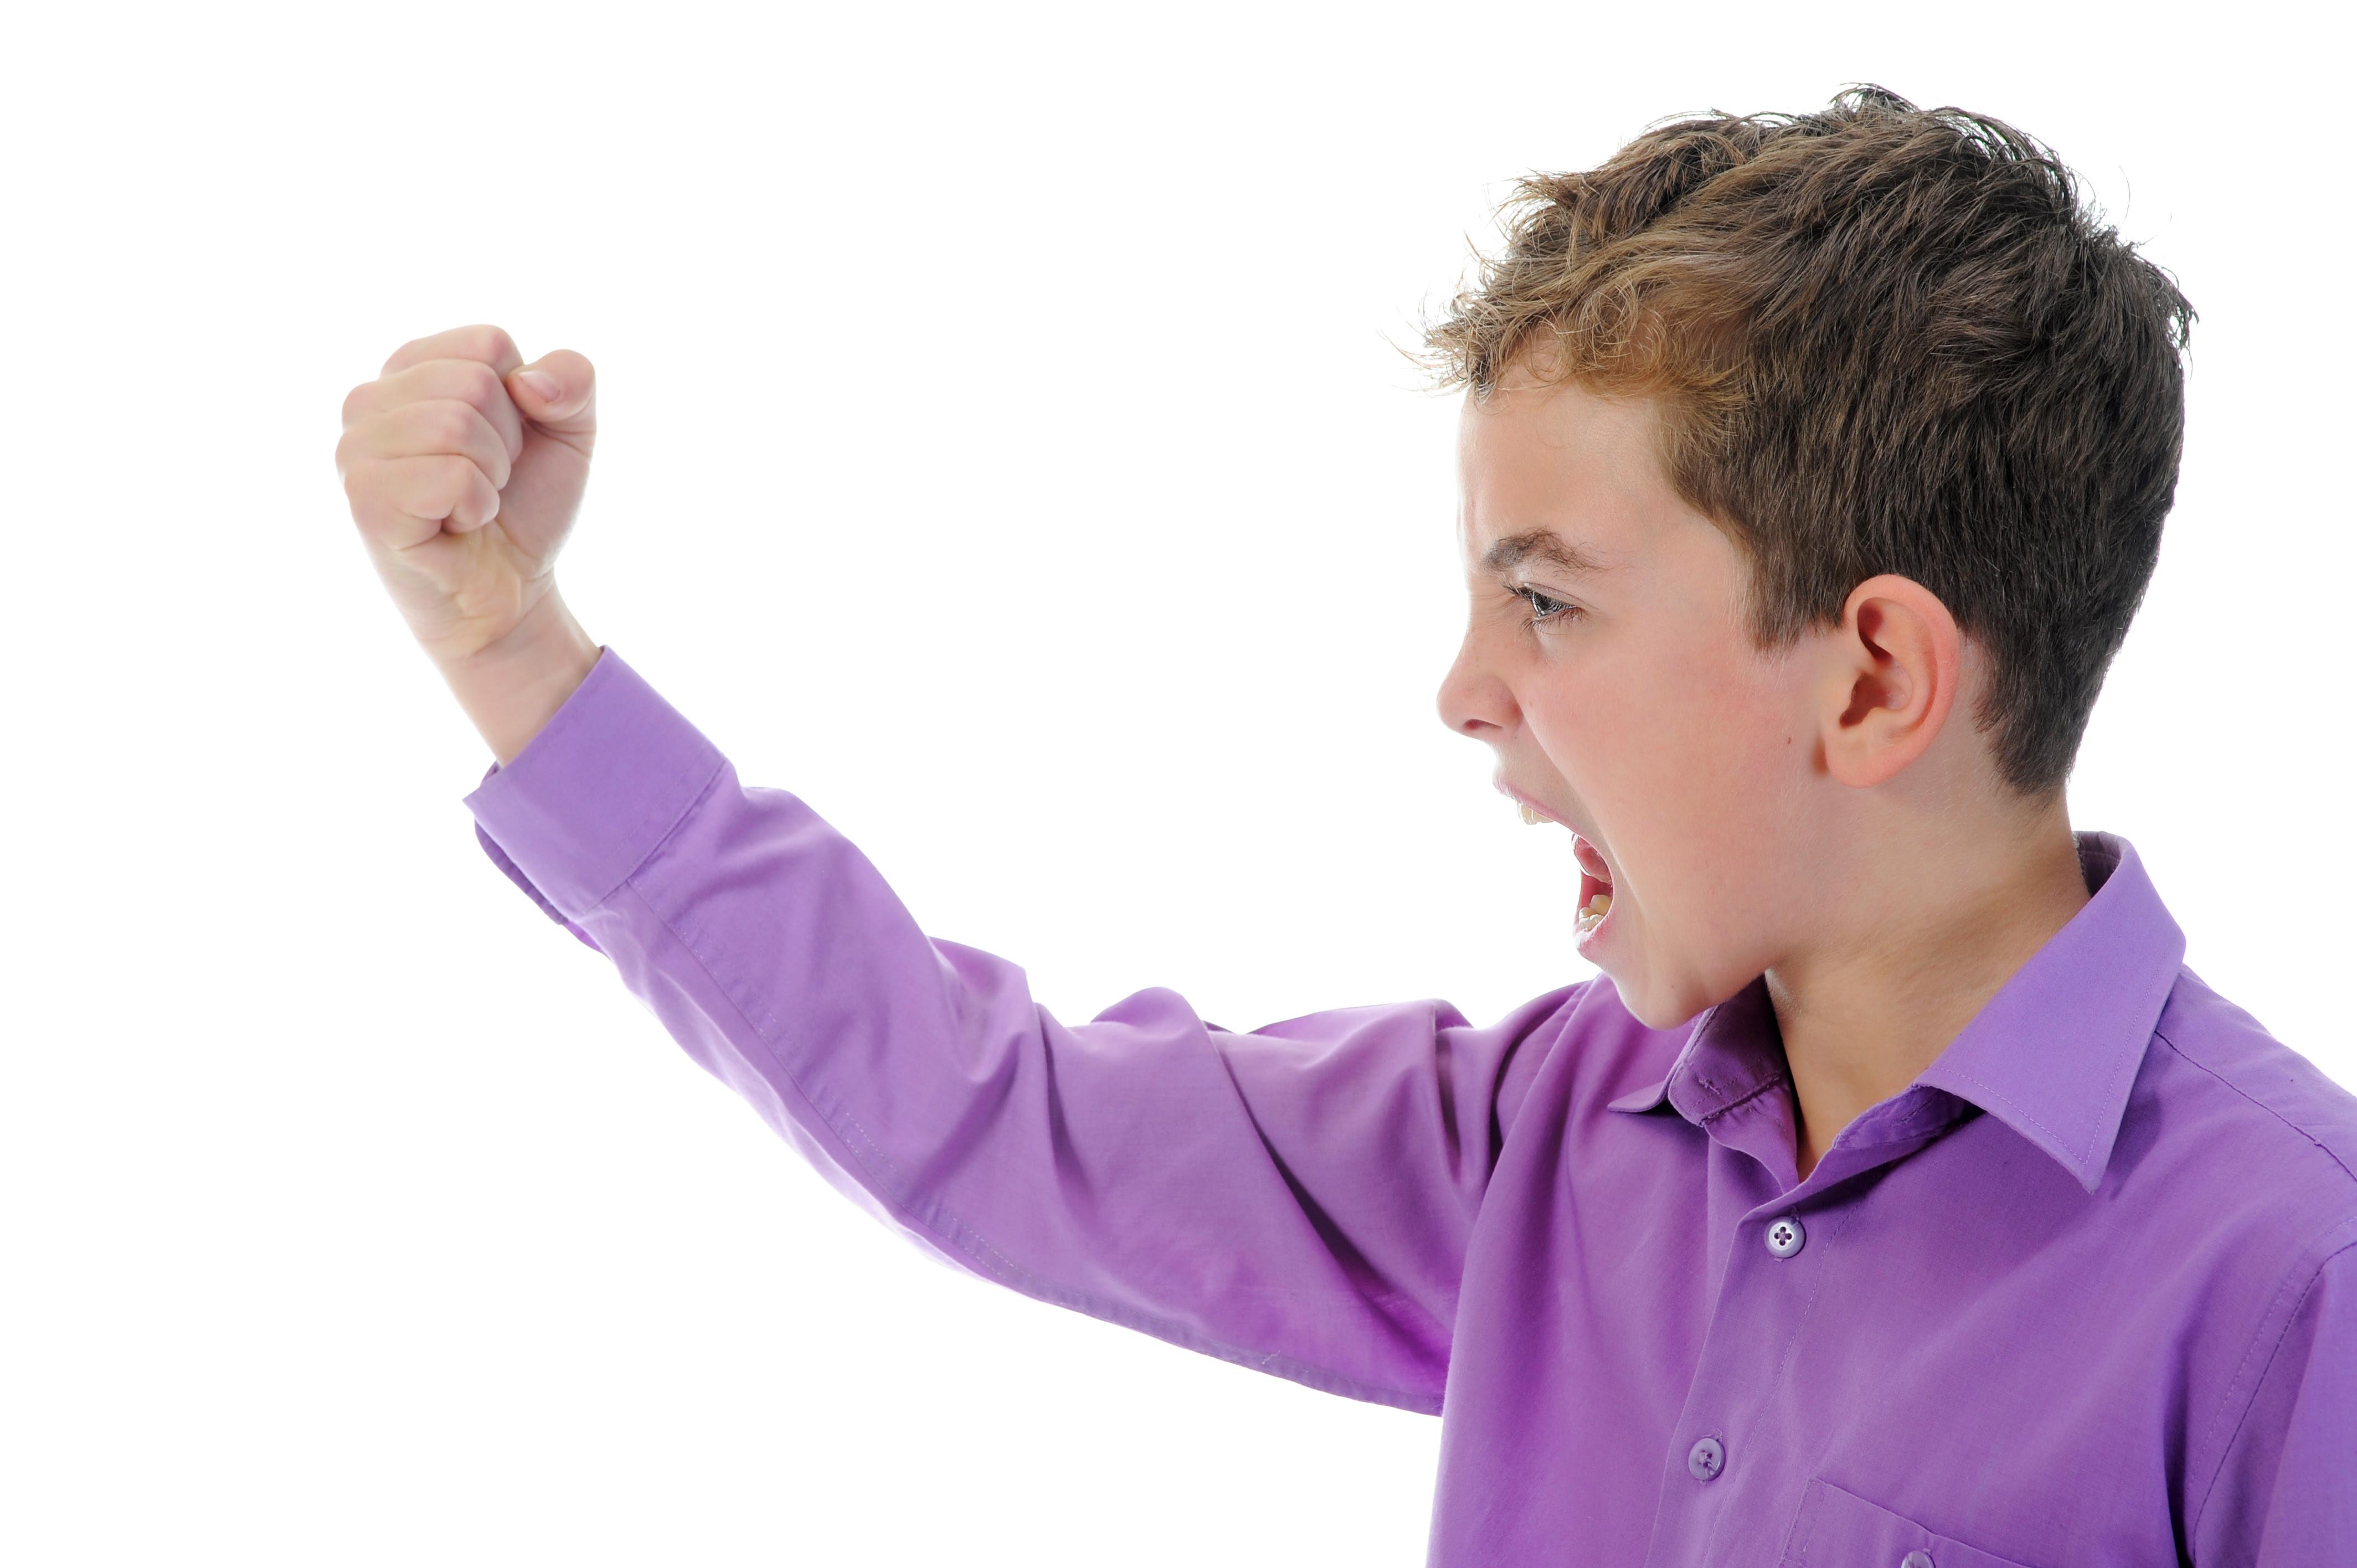 http://www.google.gr/imgres?imgurl=http://hecticparents.files.wordpress.com/2014/05/angry-kid.jpg&imgrefurl=http://hecticparents.com/2014/05/19/teaching-kids-anger-management/&h=2832&w=4256&tbnid=69LtdDxPaD9T1M:&zoom=1&docid=JkIpJ7zi29ppXM&ei=J1nSVI2zDpPXavOSgkg&tbm=isch&ved=0CEkQMygdMB0